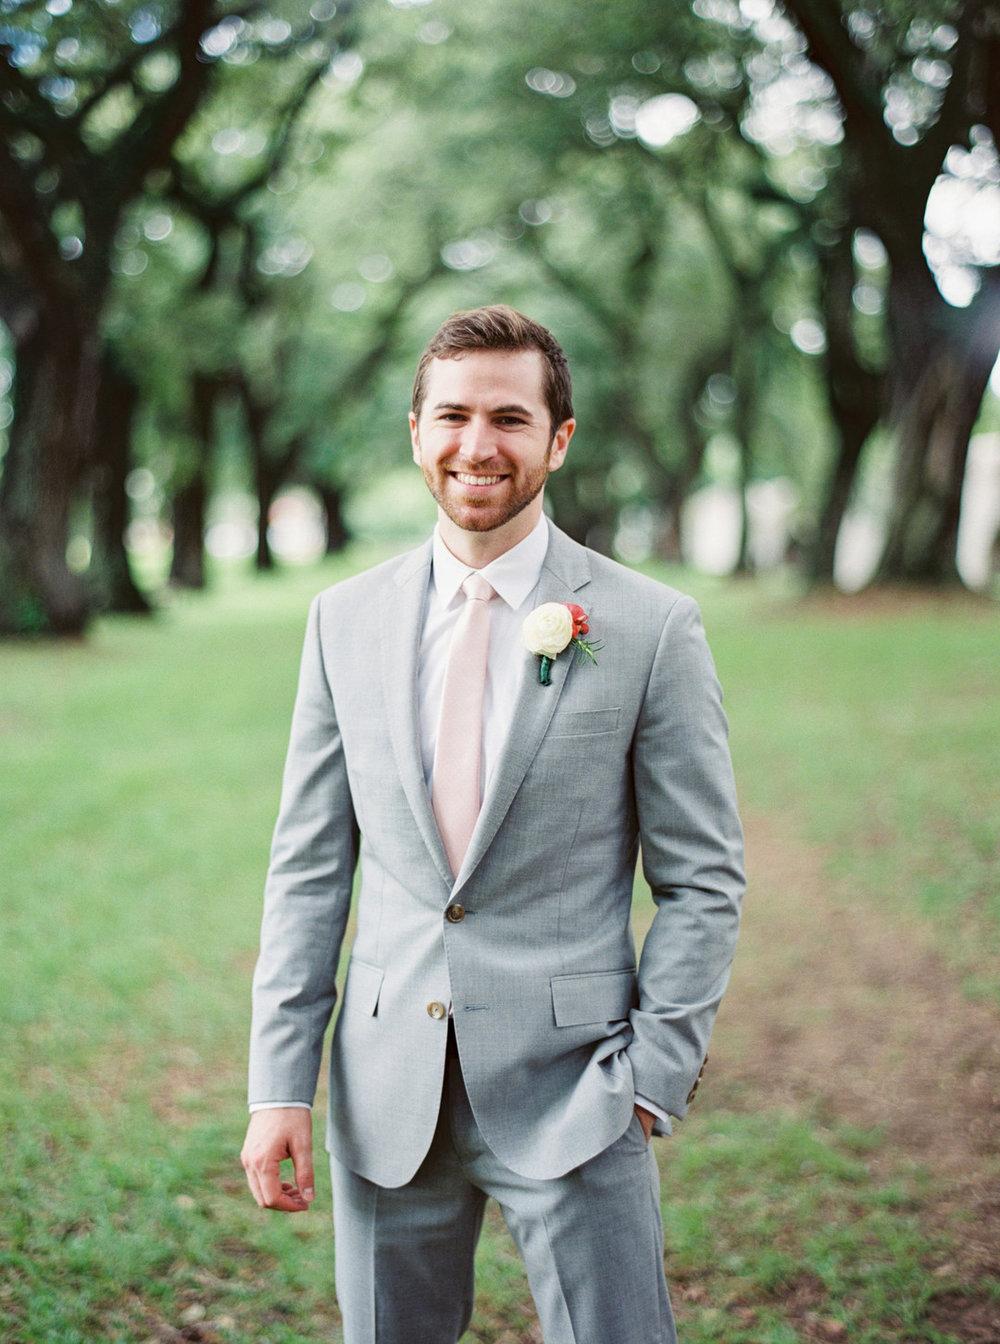 Ellen + Dylan: Beautifully Personalized McLeod Plantation Wedding | Palmetto State Weddings